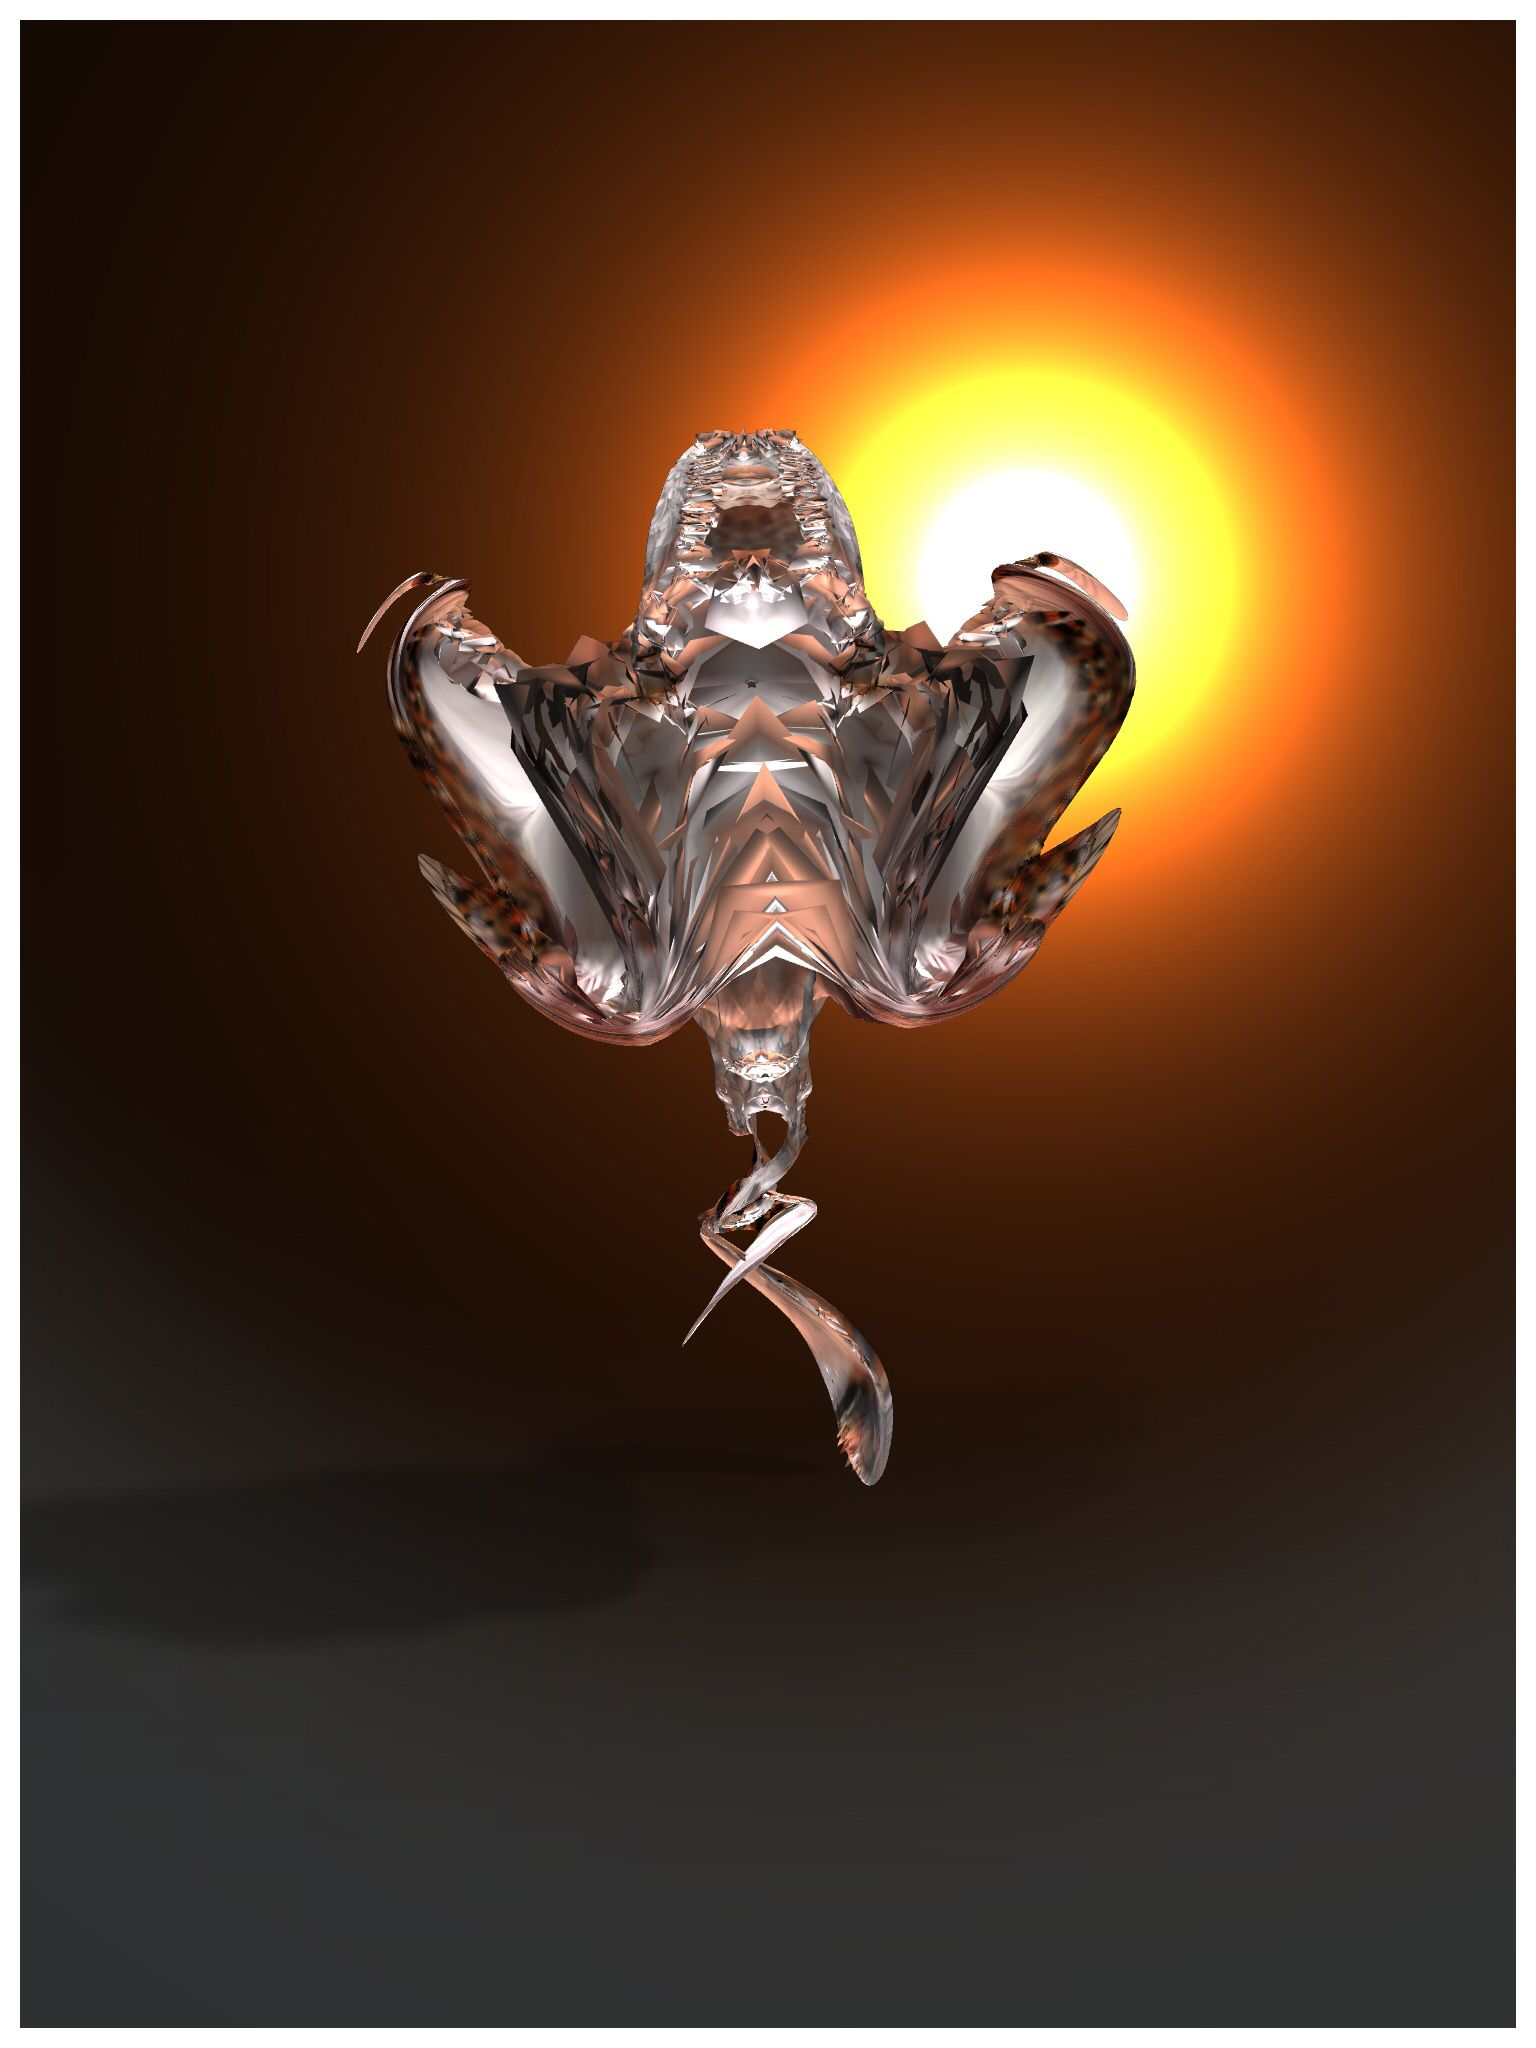 Unknown 3D